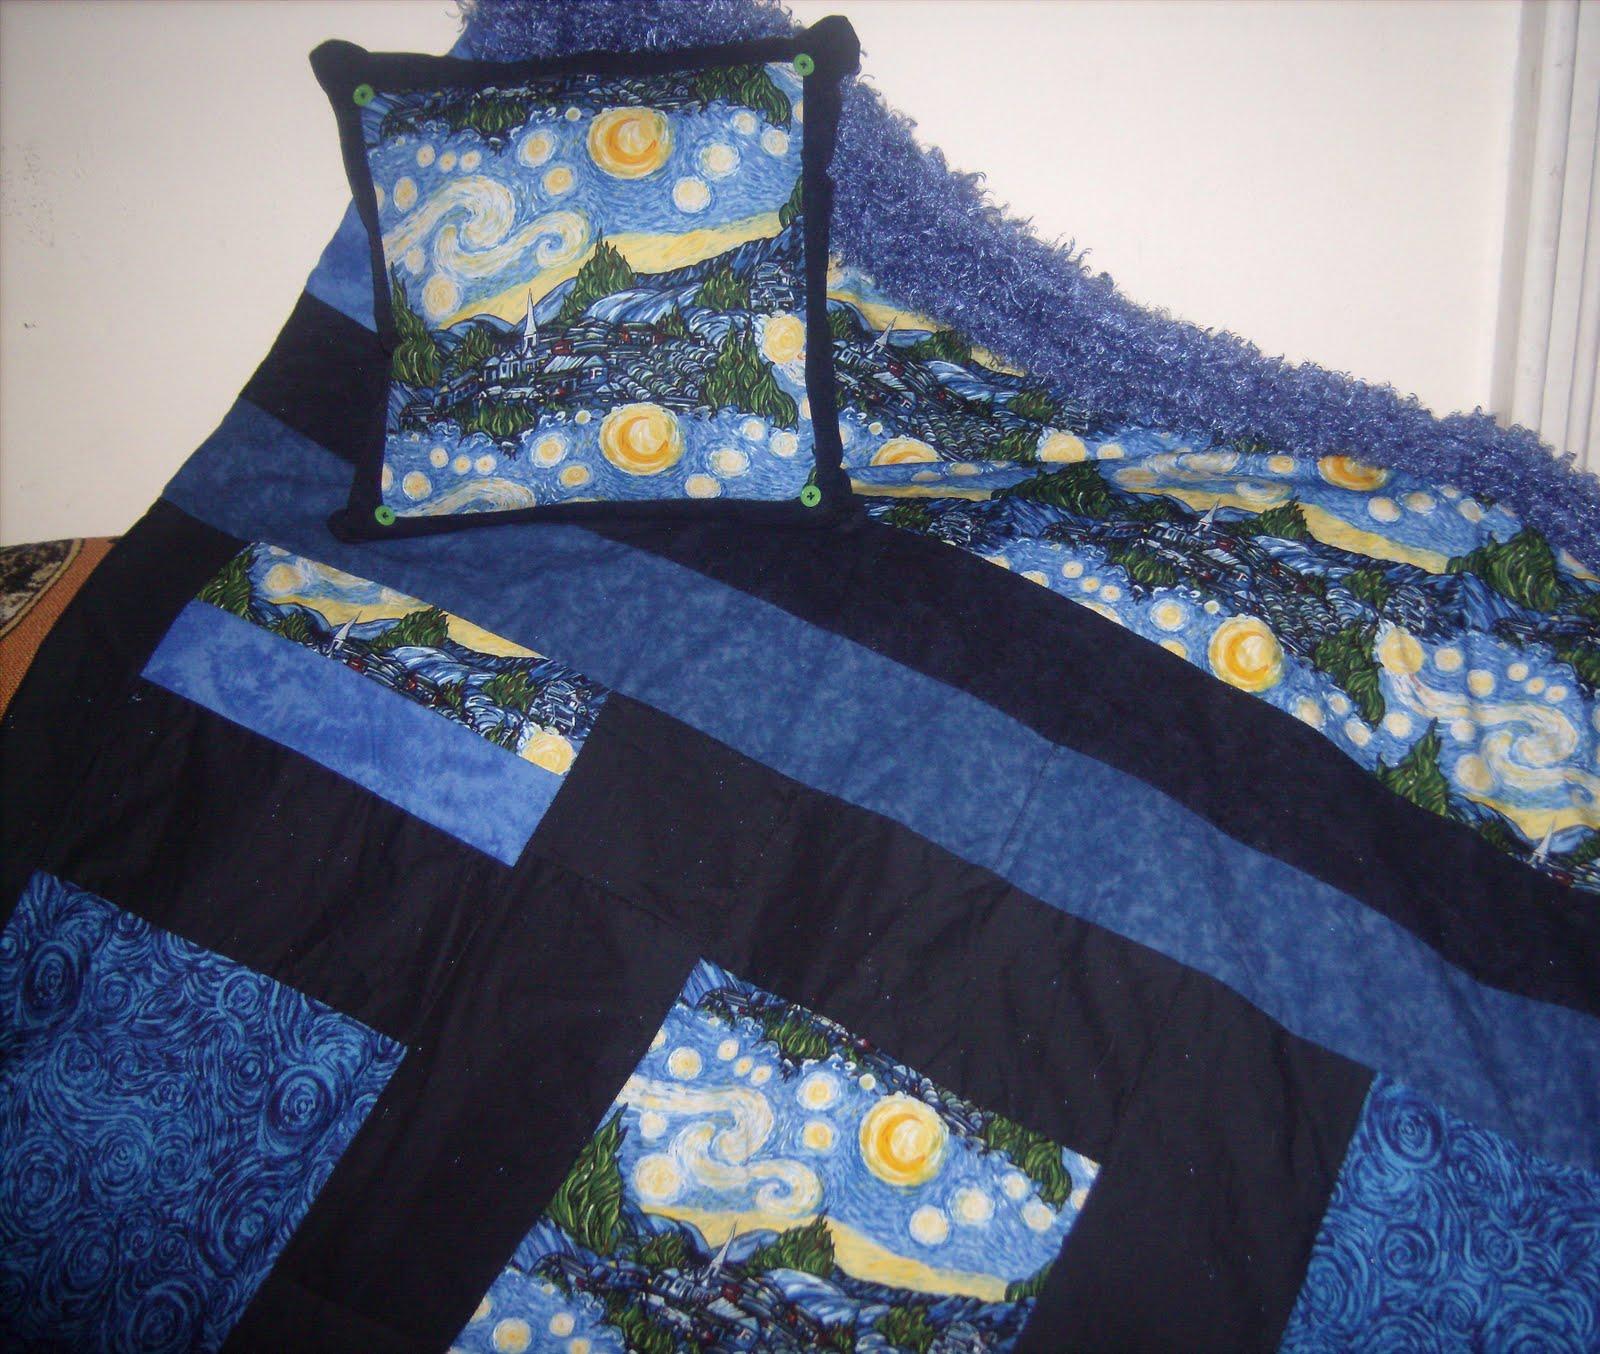 Gina Scustomcreations Vincent Van Gogh Starry Night